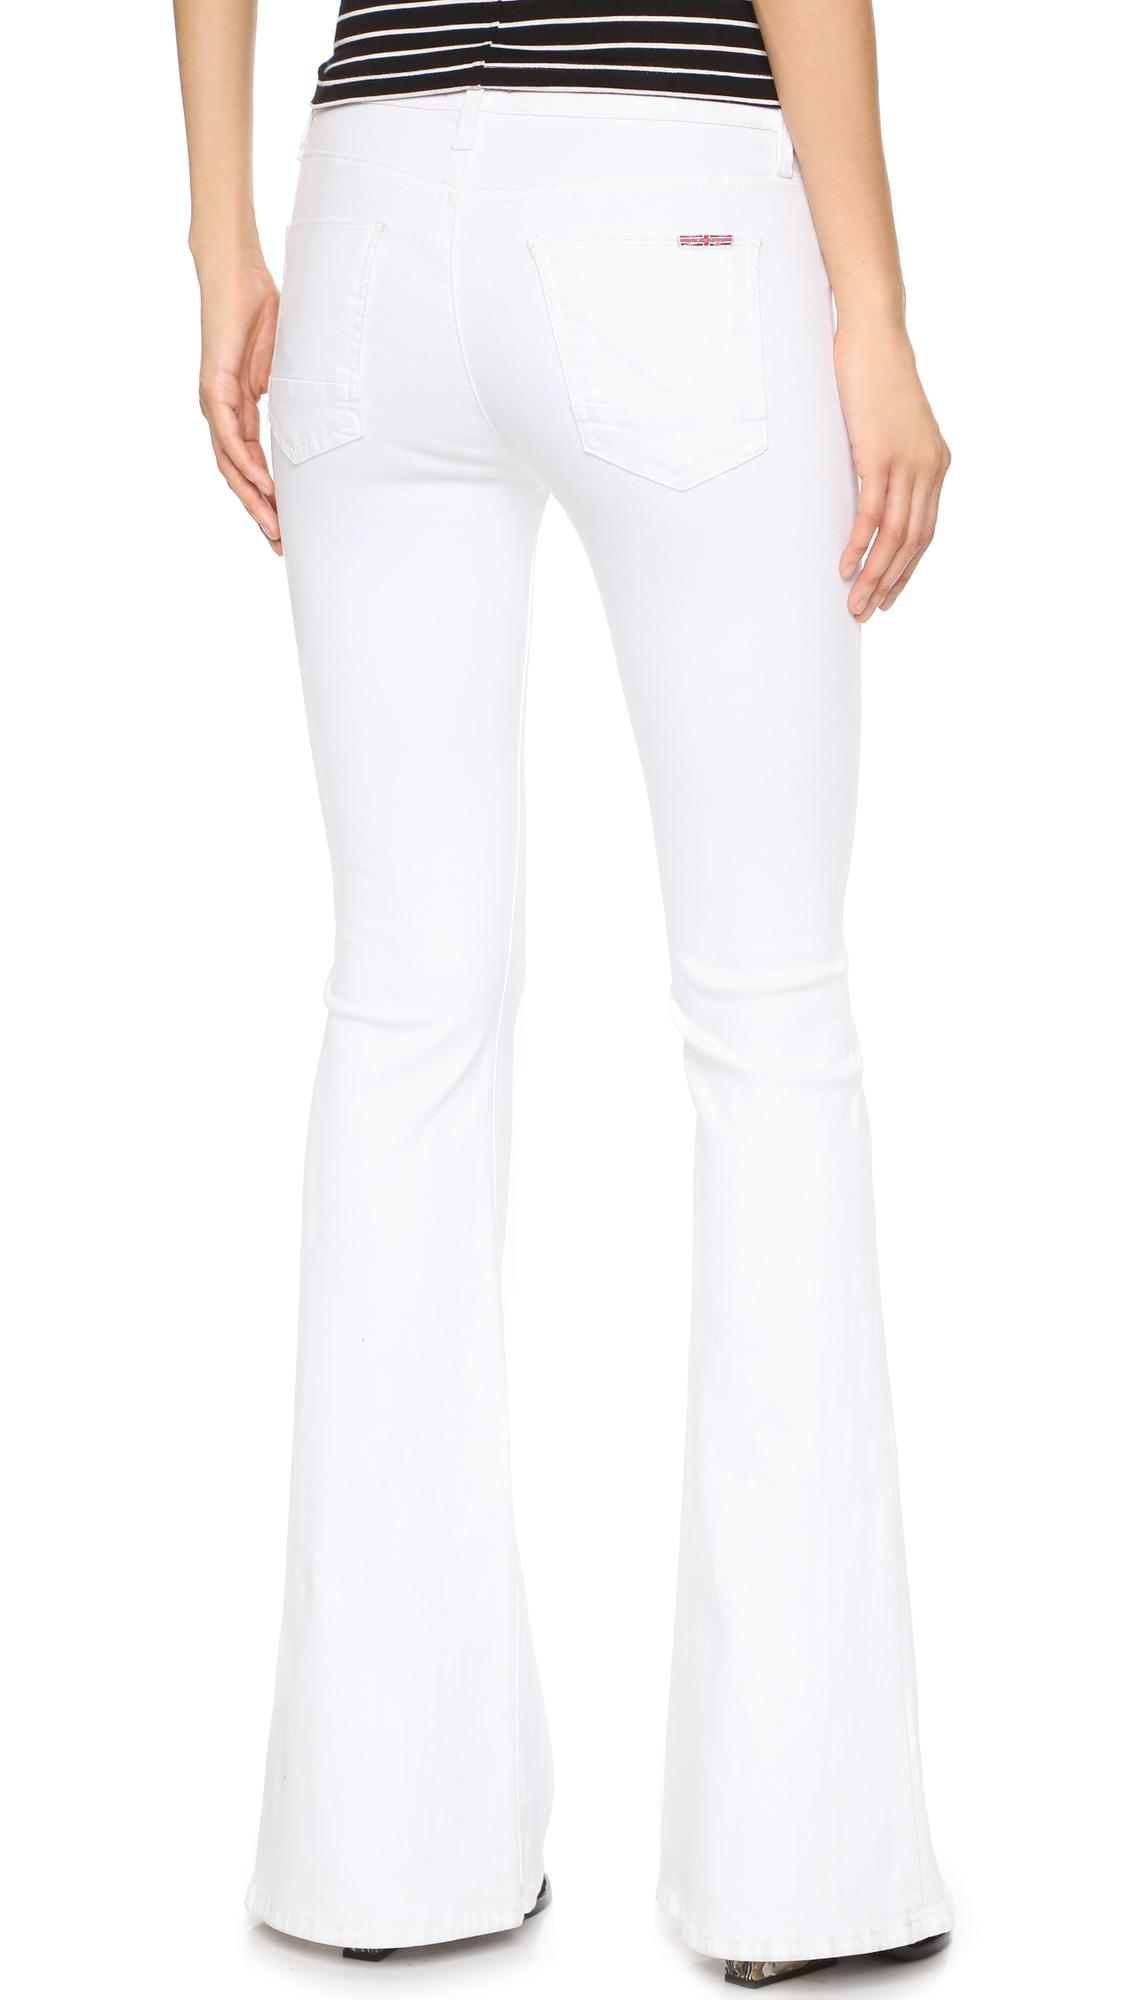 Womens Boot Cut Jeans